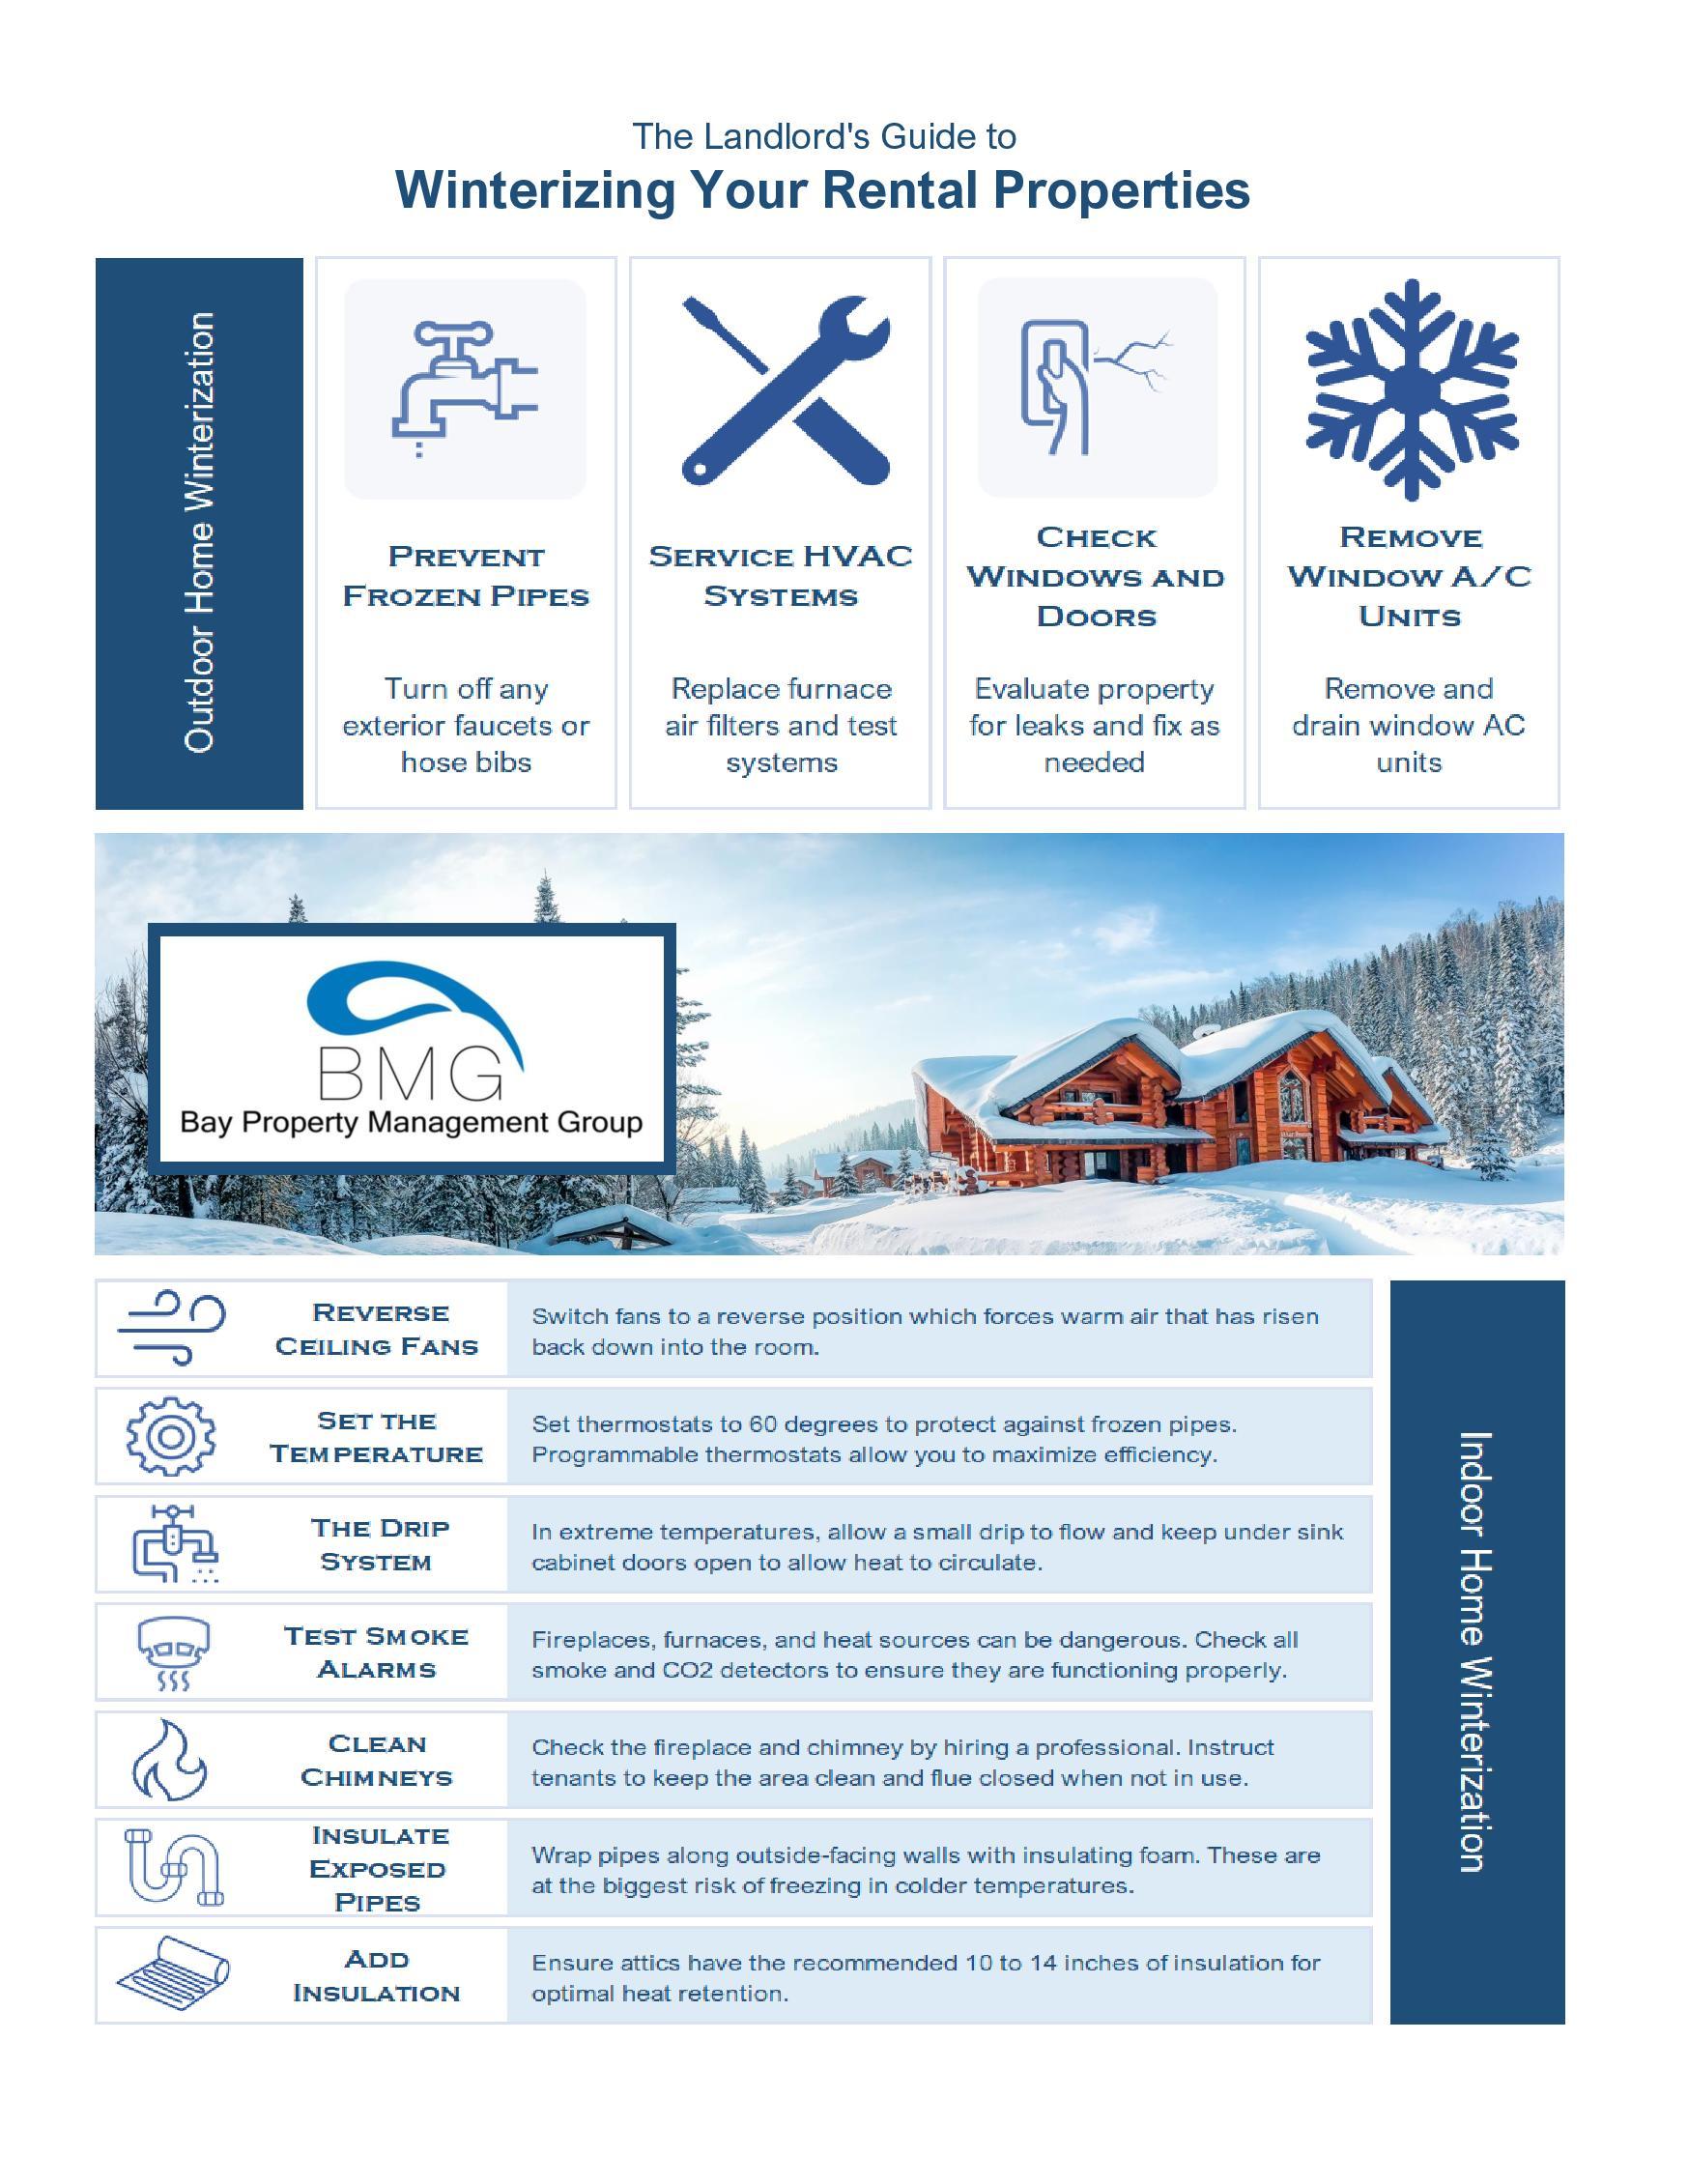 winterize rental property